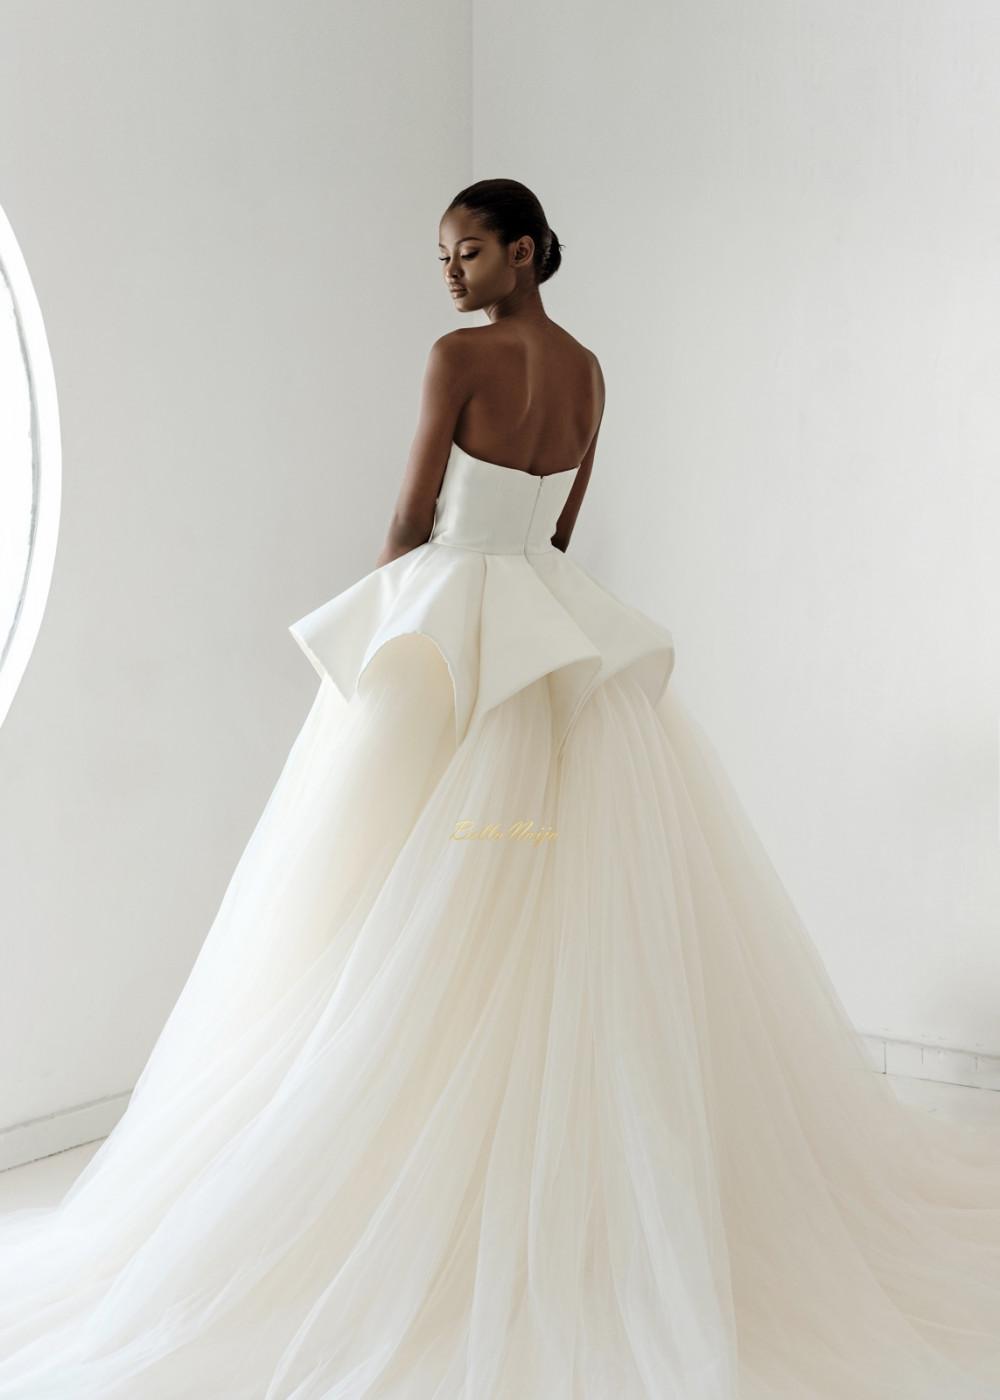 Wedding Dress Steamer 31 Beautiful The Andrea Iyamah bridal